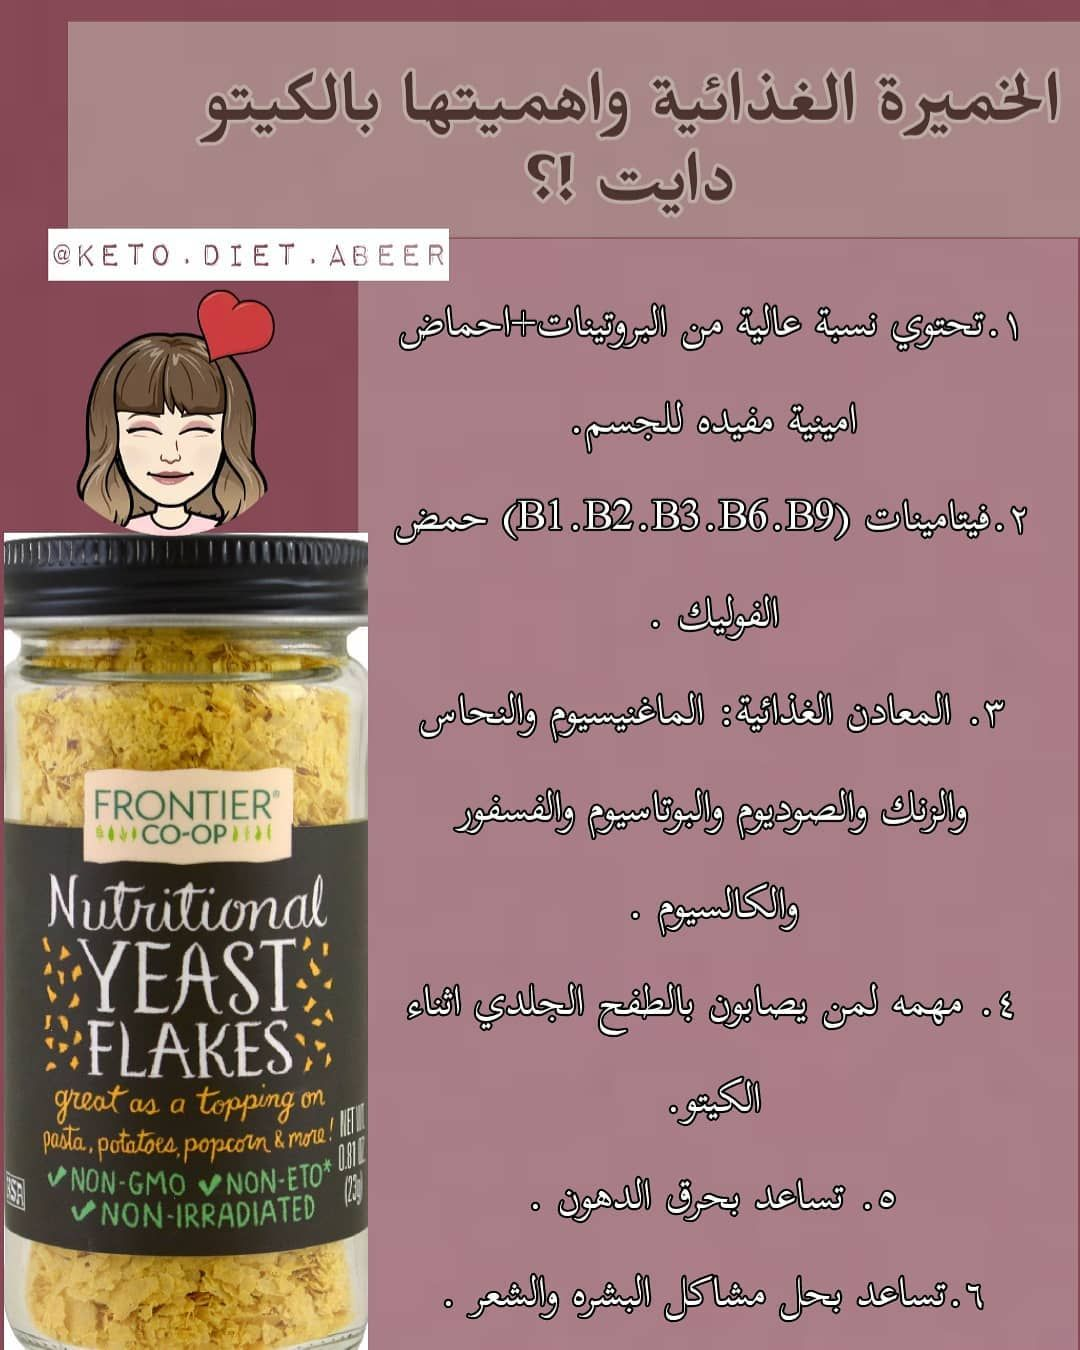 Pin By Ahlam Totanjy On كيتو دايت Keto Diet Recipes Health Fitness Nutrition Nutrition